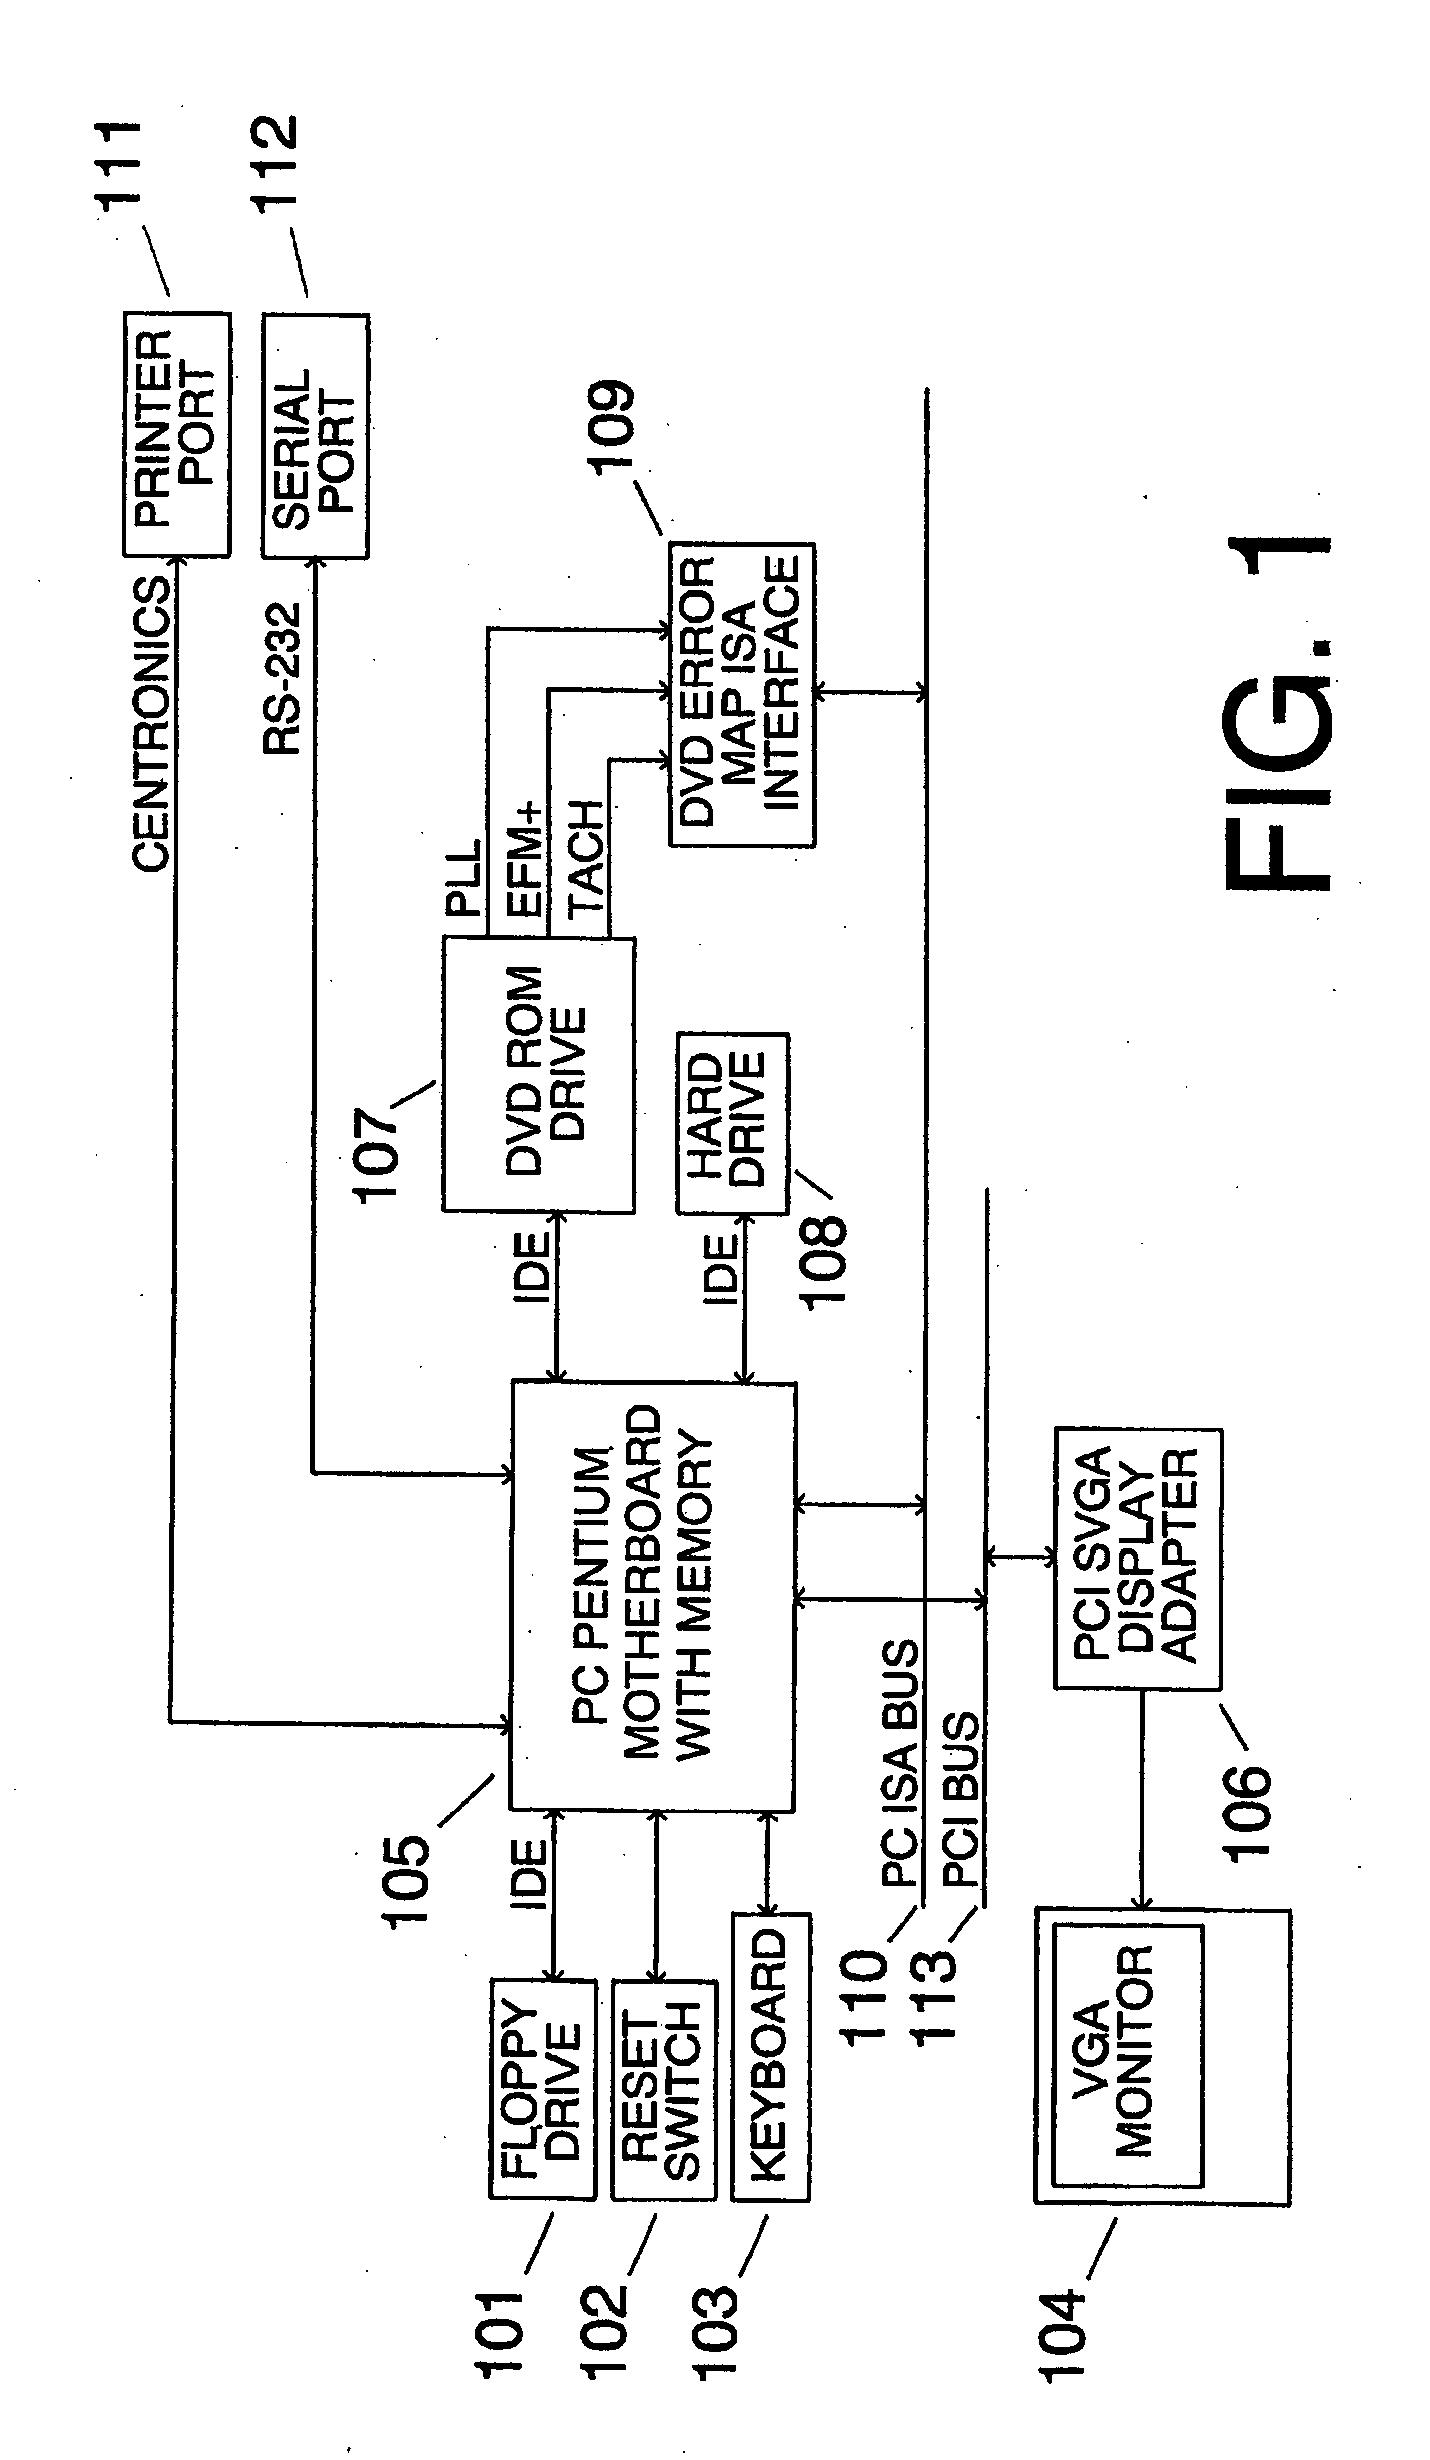 Patent Us20050283700 Digital Error Mapping Circuit And Method Logic Diagram In Isa Format Drawing